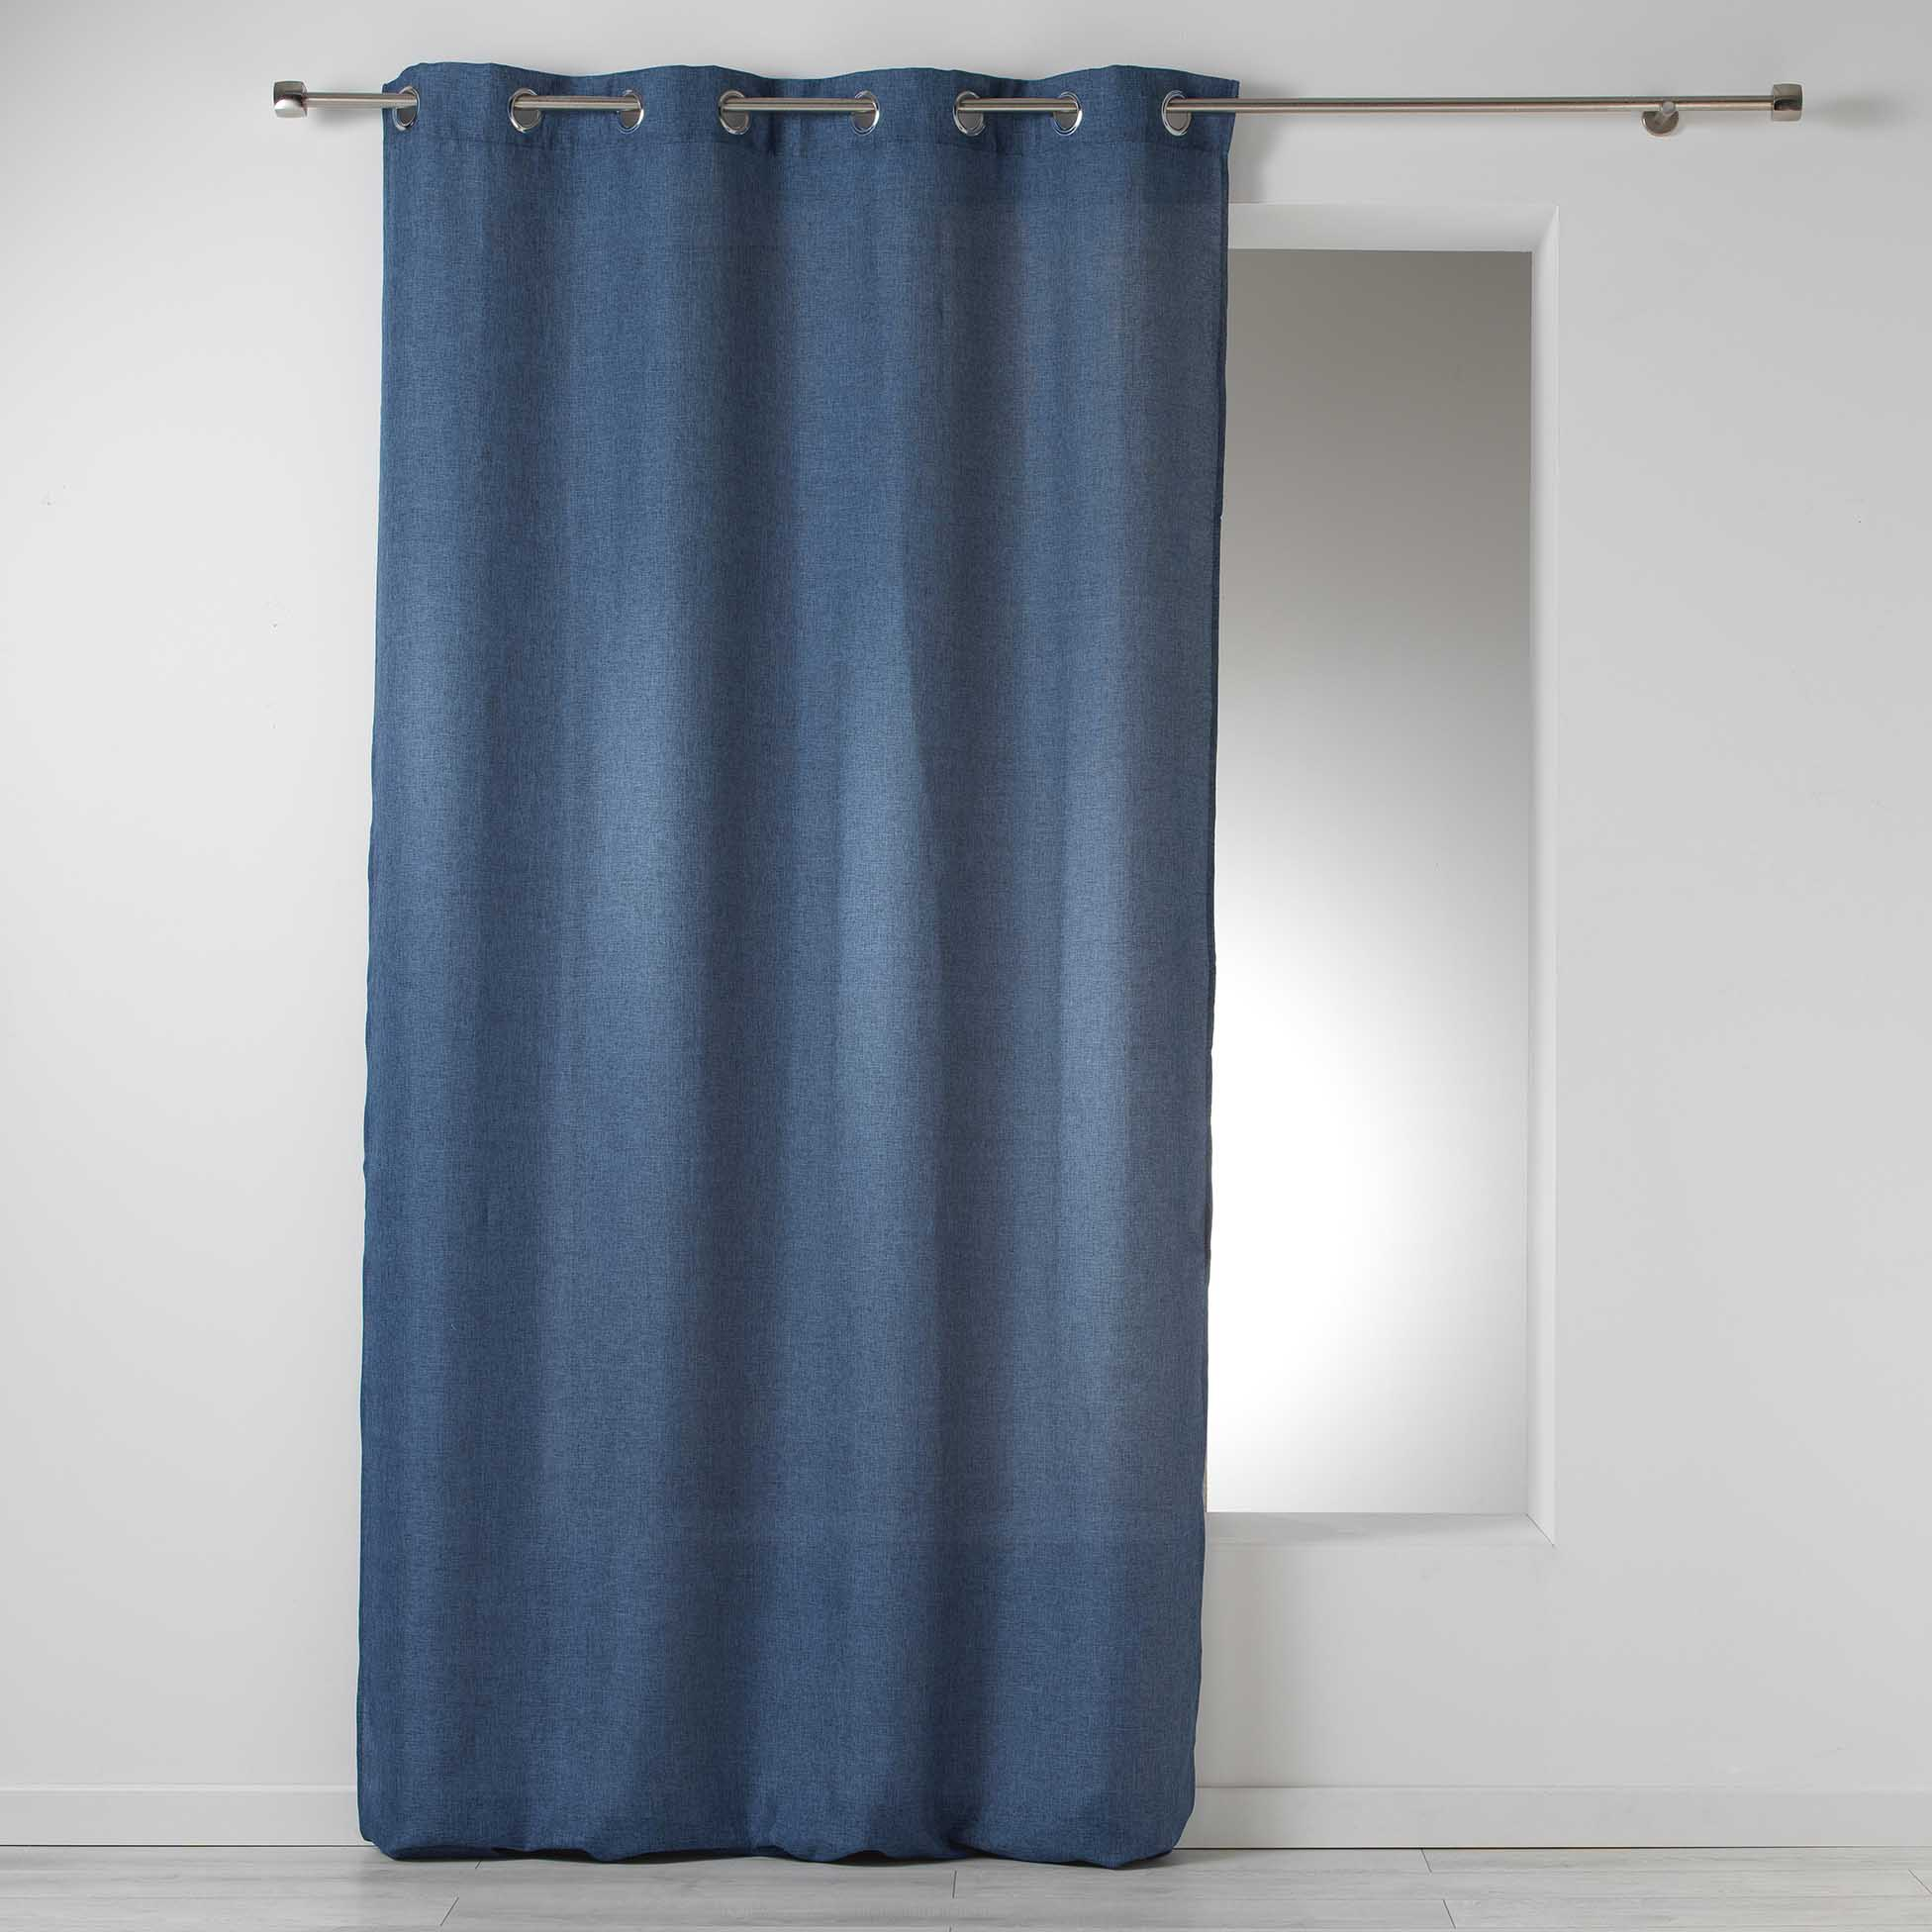 Cortina Loneta con Ojales, Tejido Translúcido Frida, Azul marino